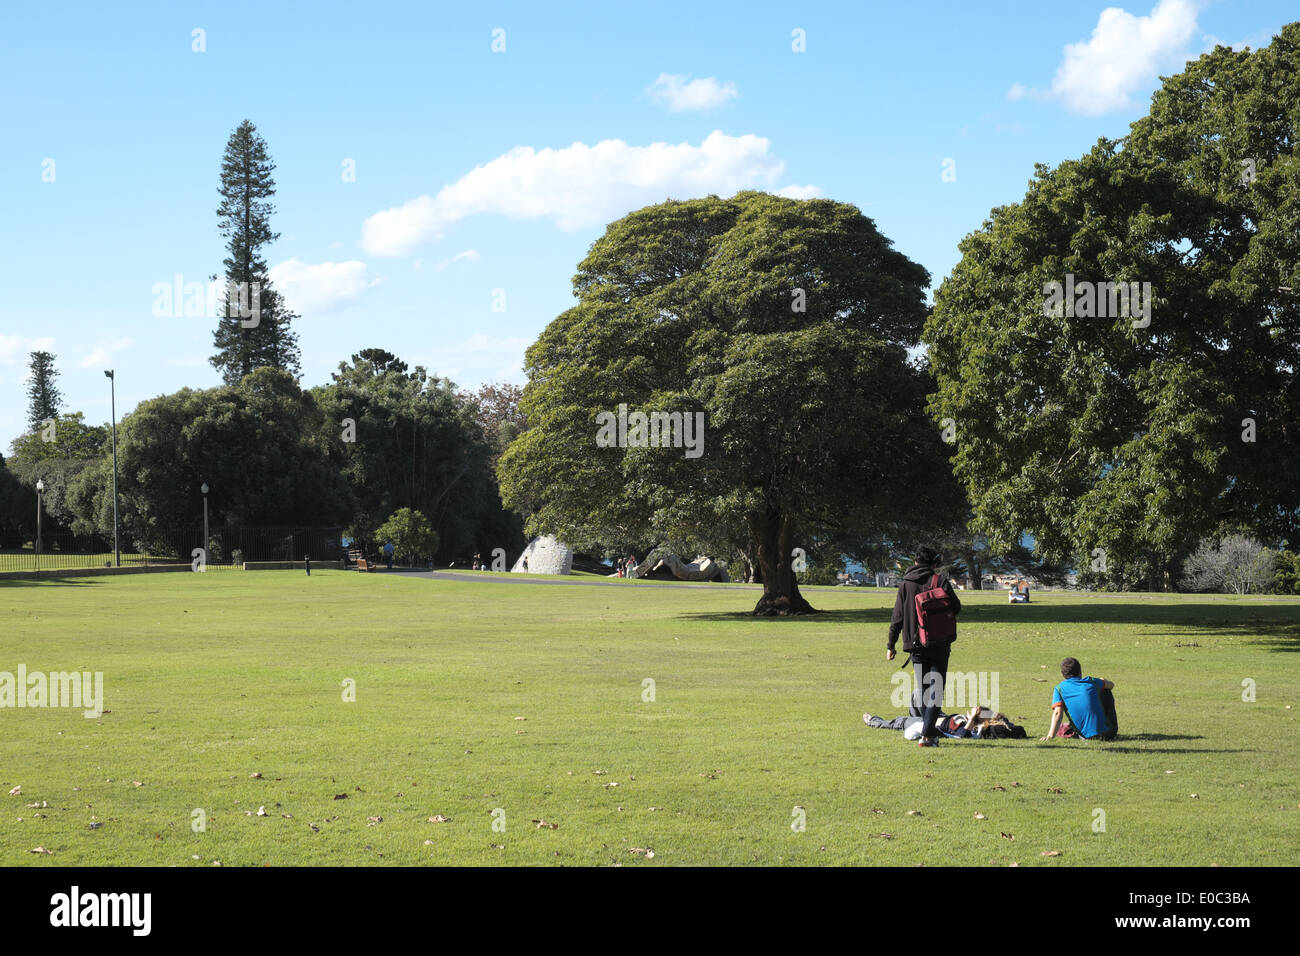 Royal Botanic Gardens in Sydney city centre, australia - Stock Image